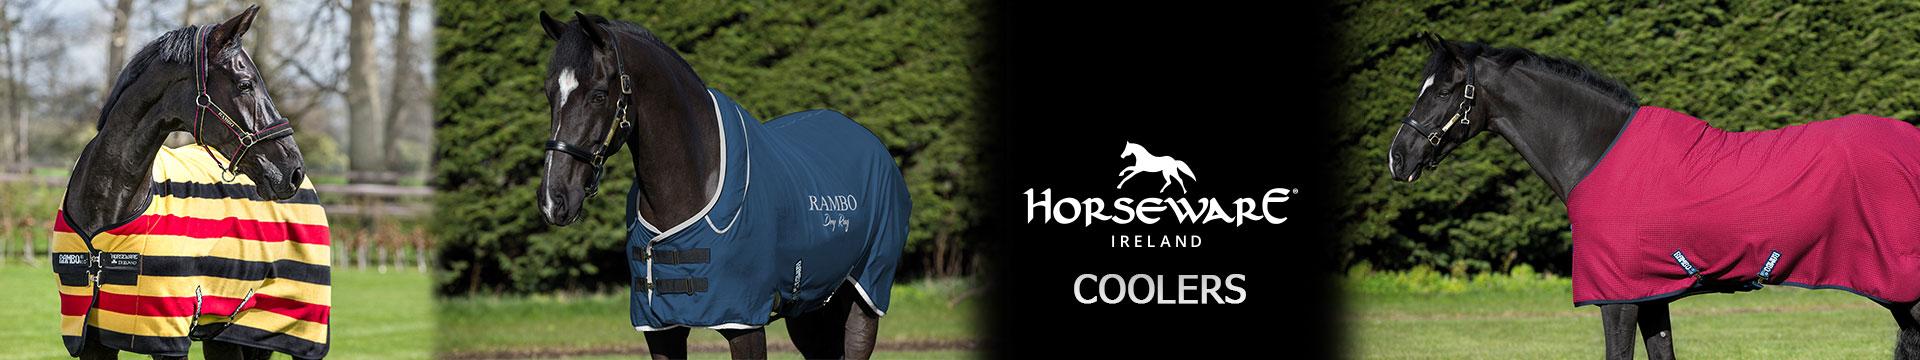 Horseware Coolers